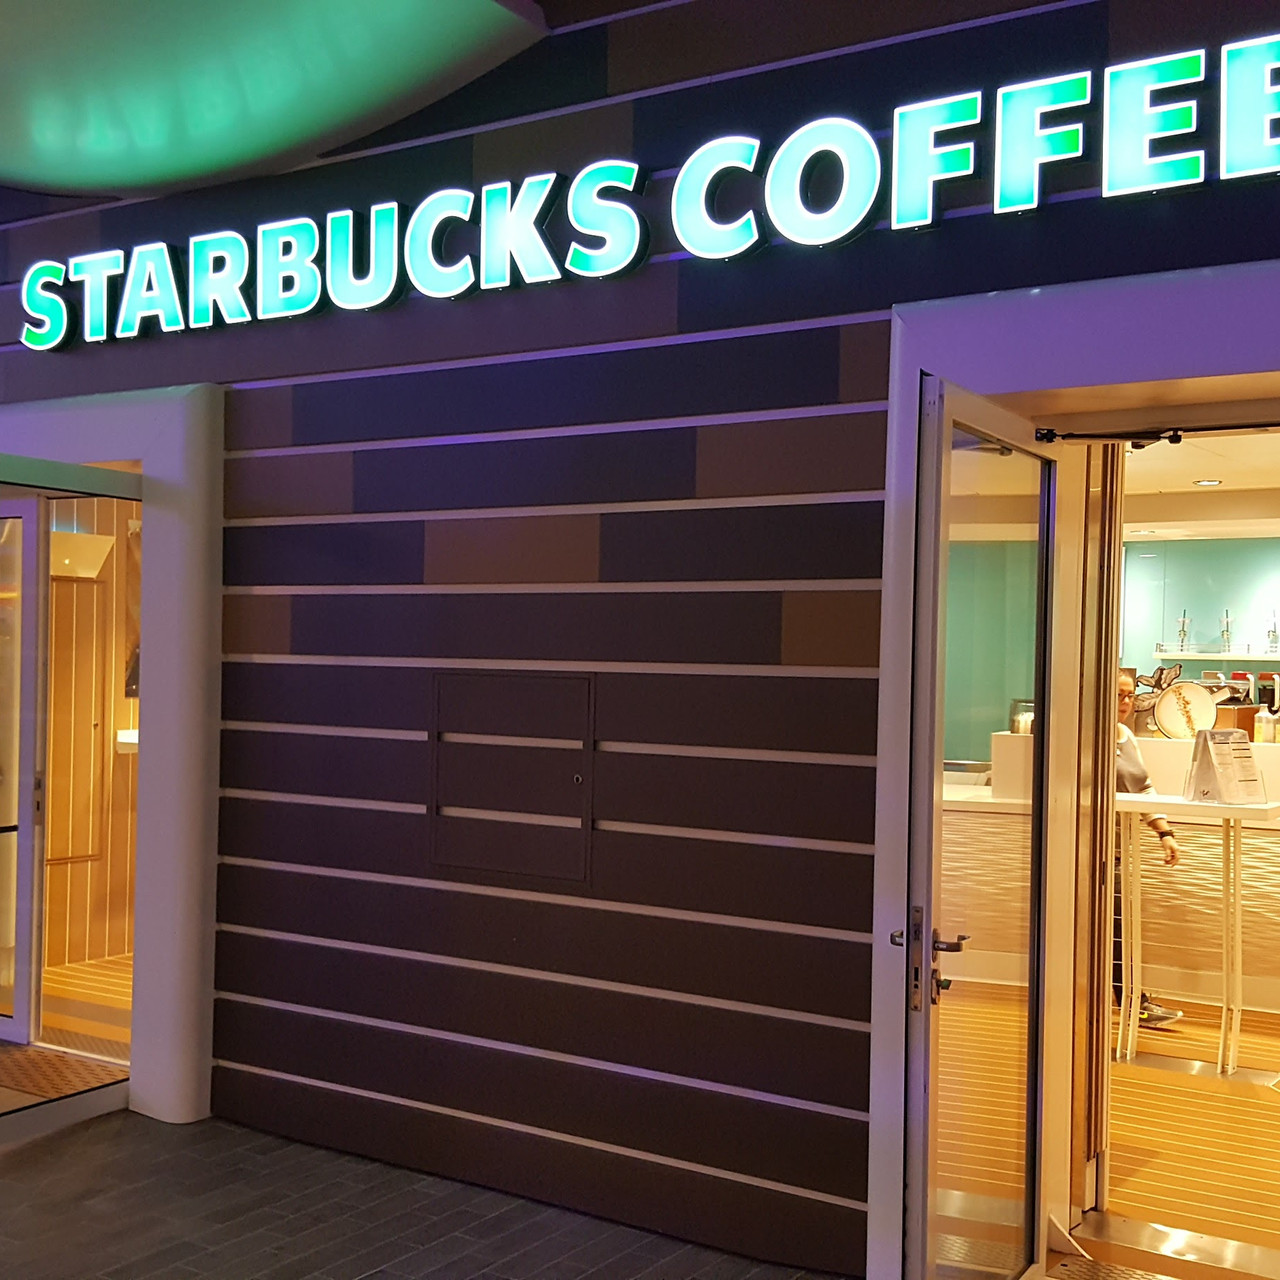 Starbucks onboard HOTS